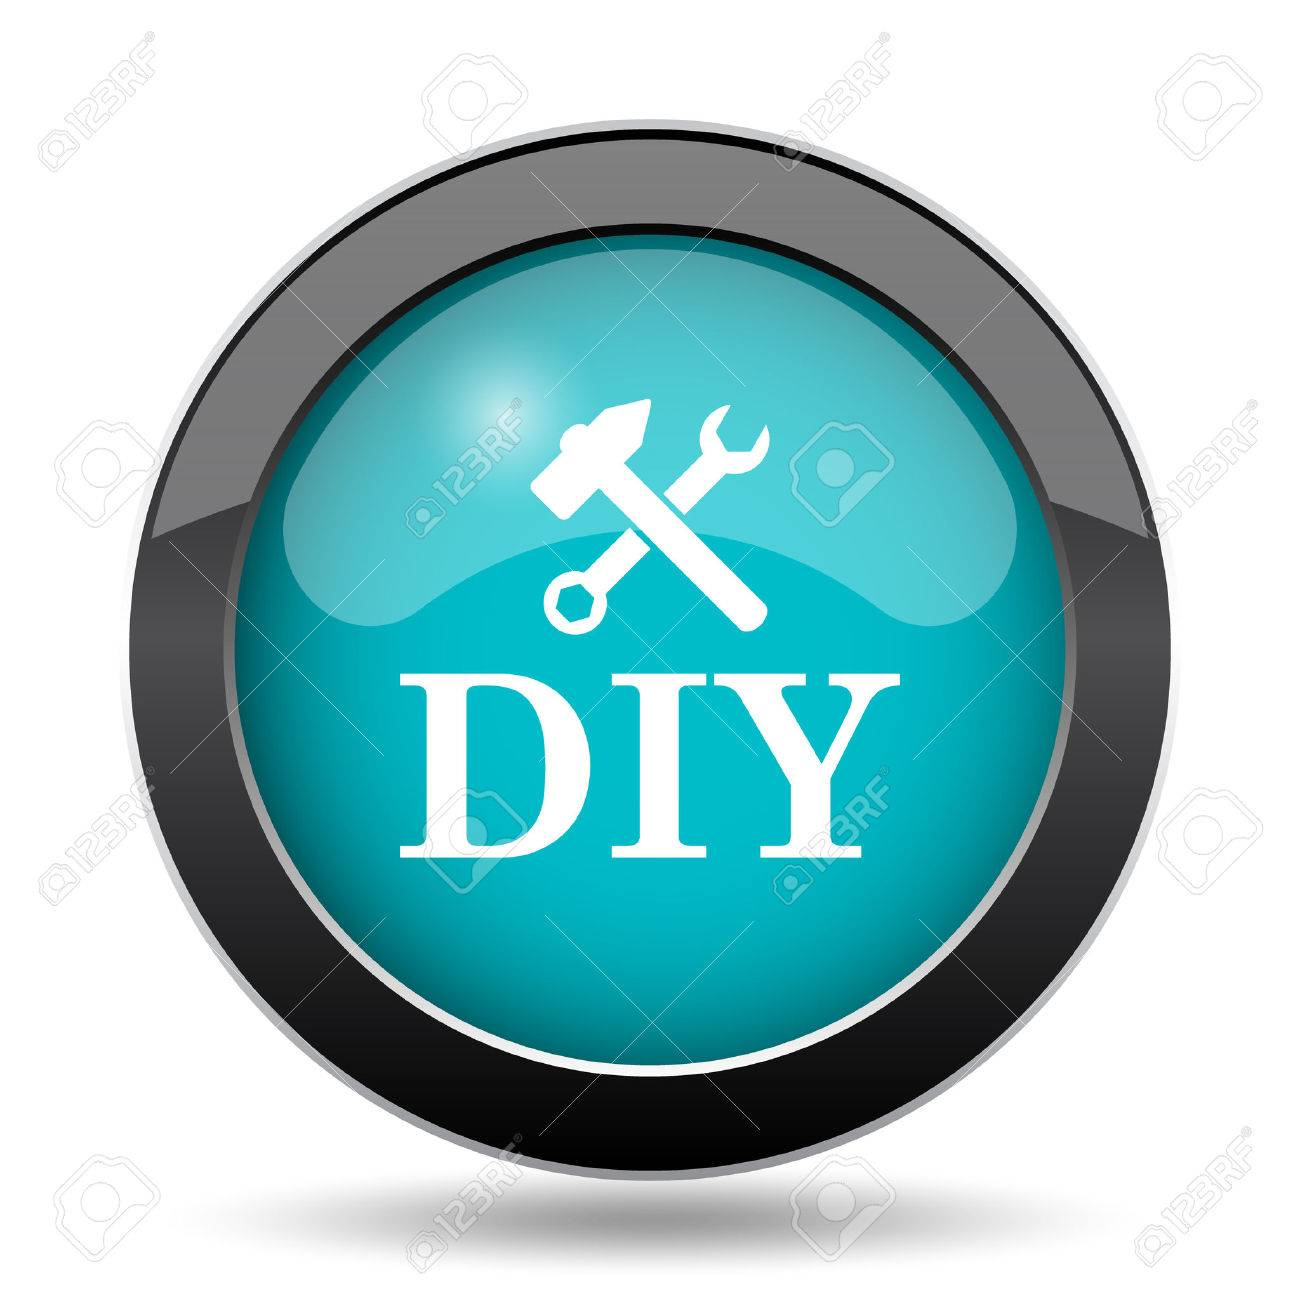 DIY icon  DIY website button on white background